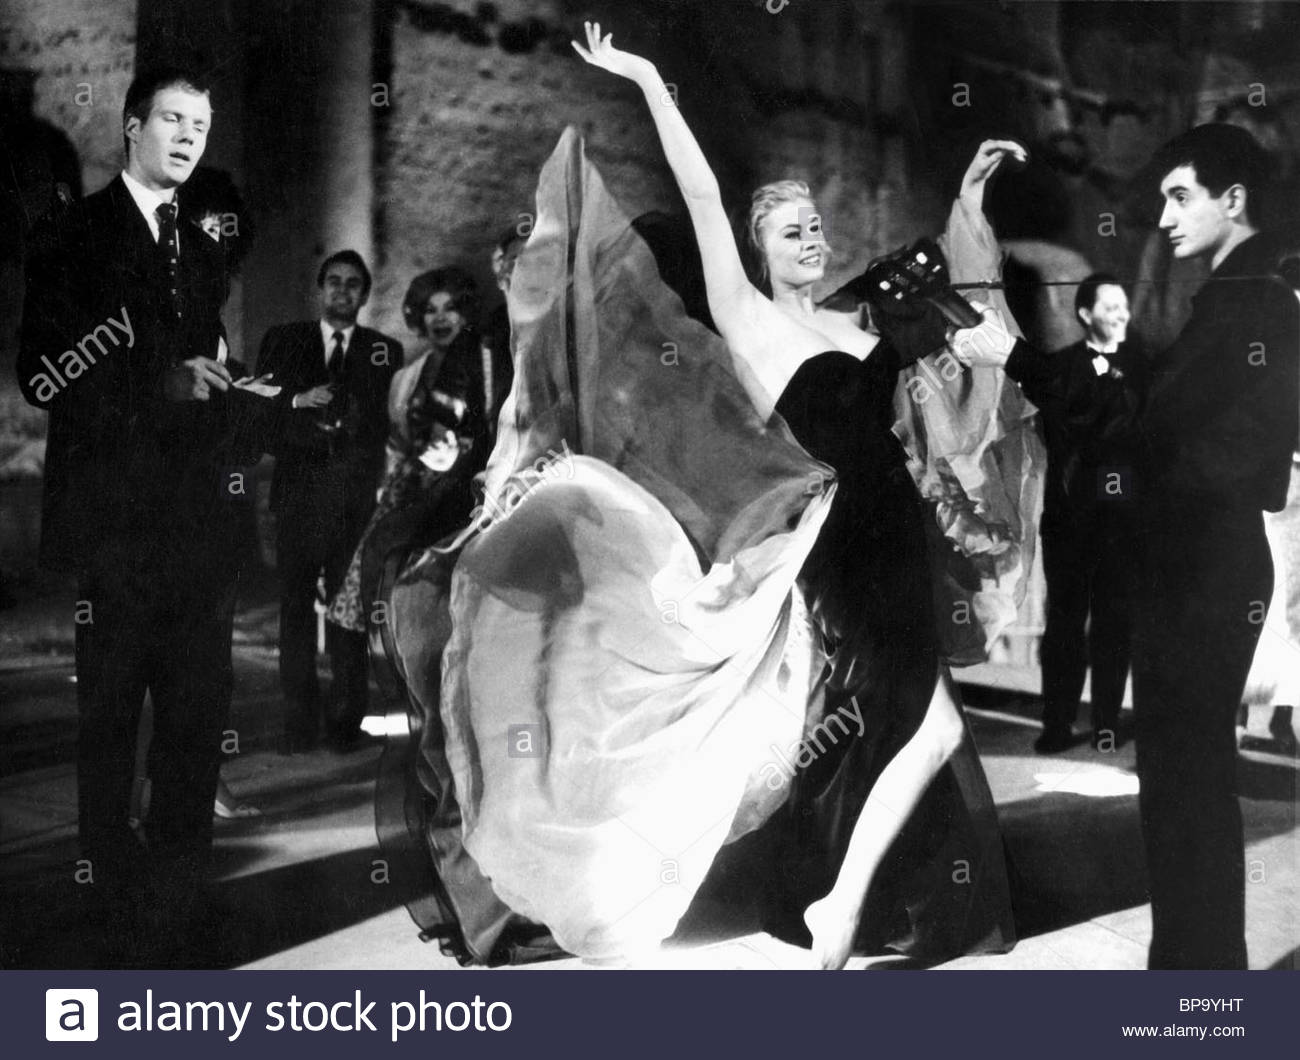 ANITA EKBERG LA DOLCE VITA (1960)